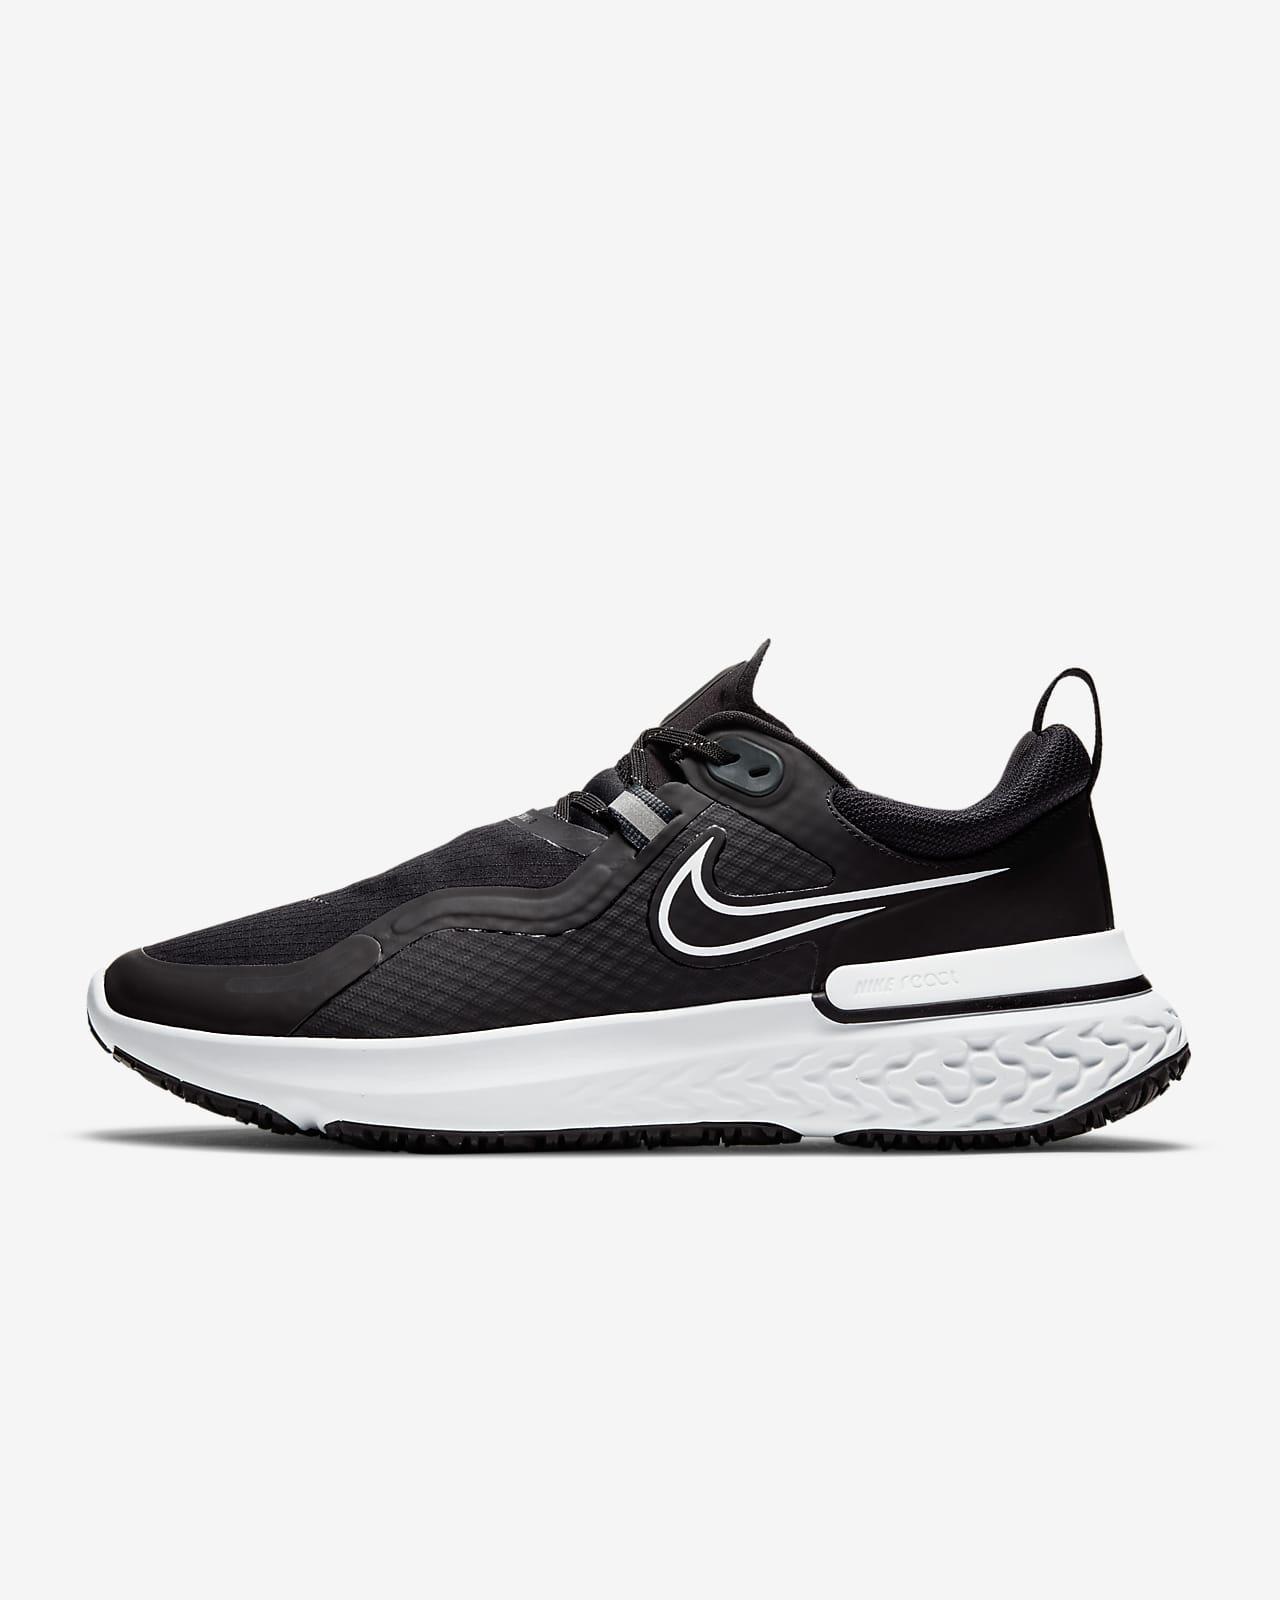 Męskie buty do biegania Nike React Miler Shield